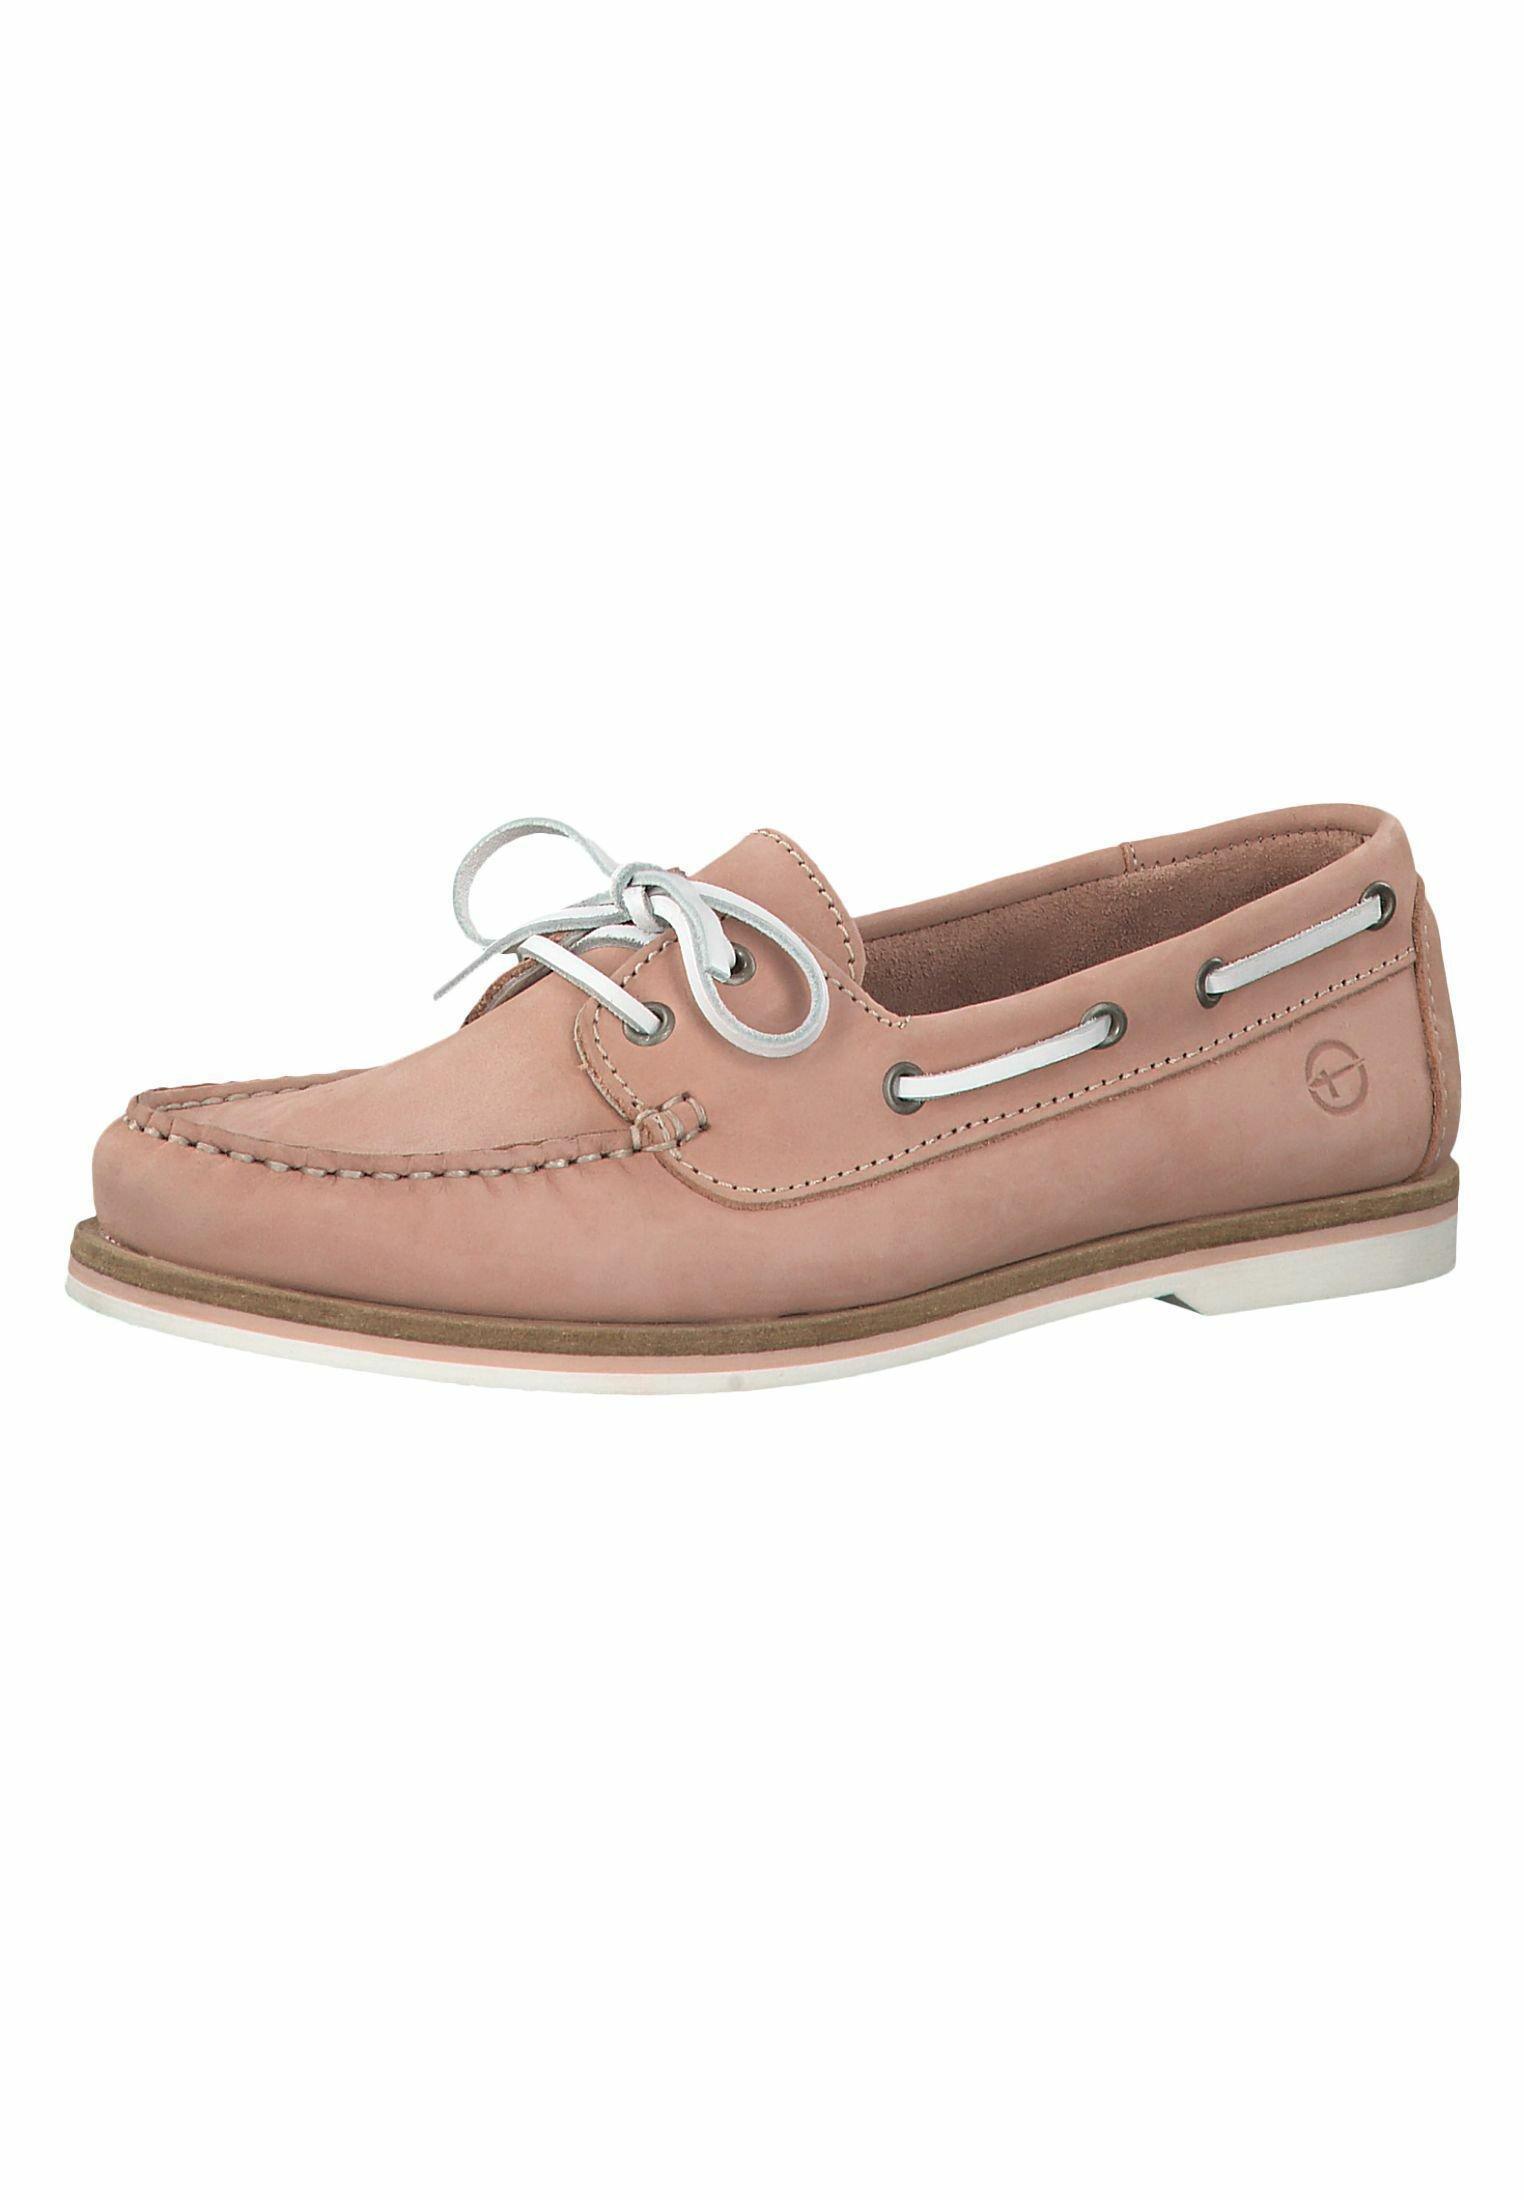 Tamaris Lace-up - Chaussures Bateau Light Pink 9PnhLNb